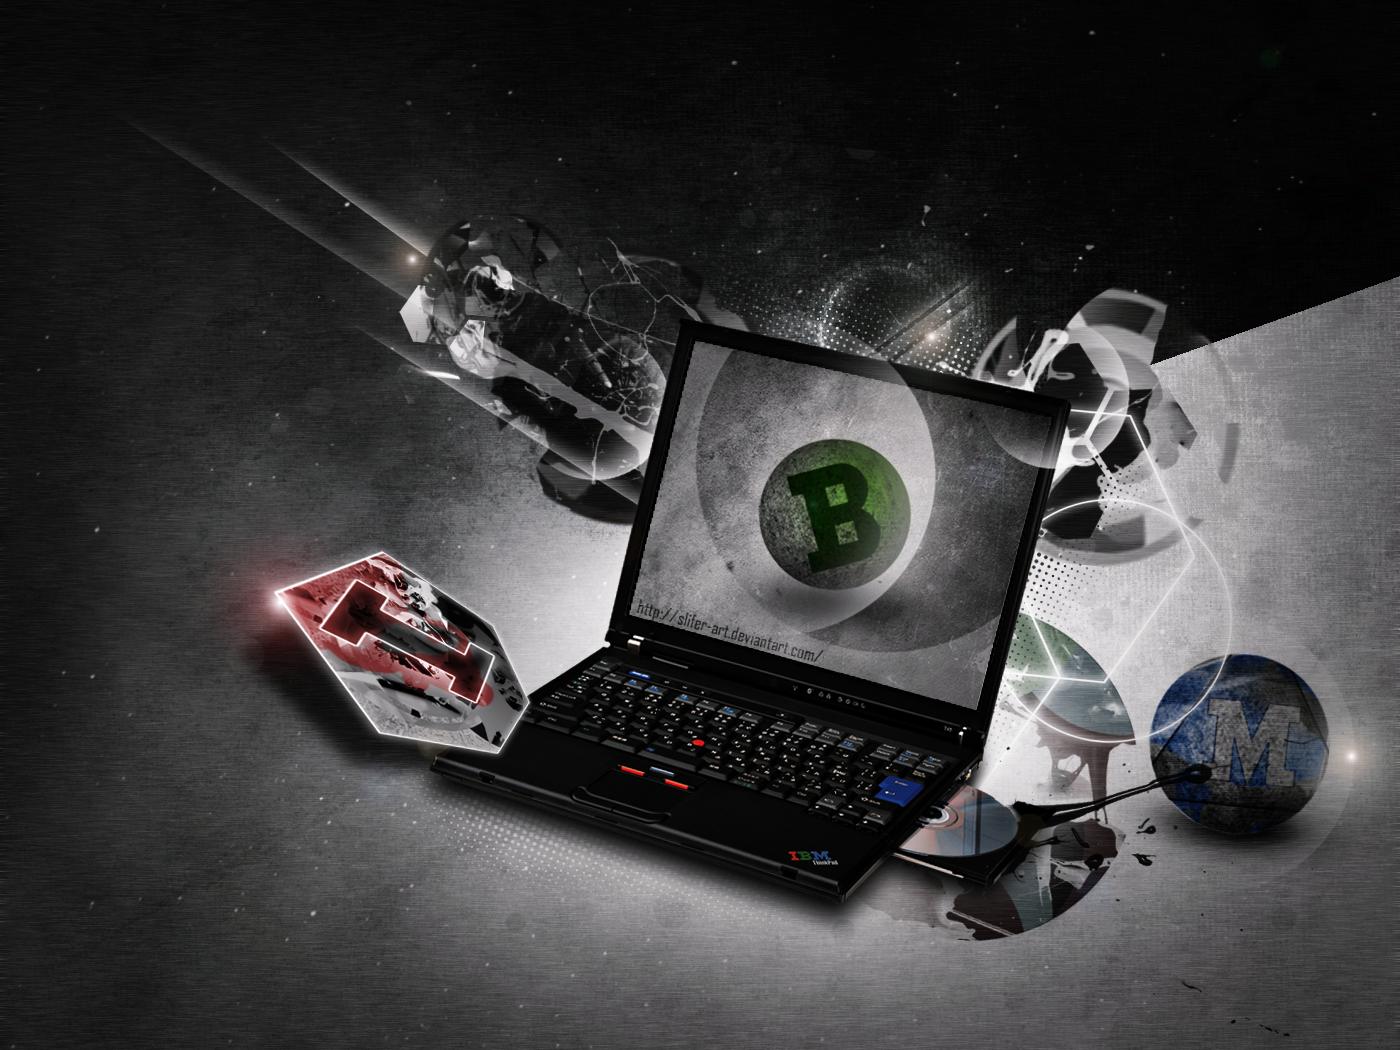 ThinkPad IBM by Slifer-ArT